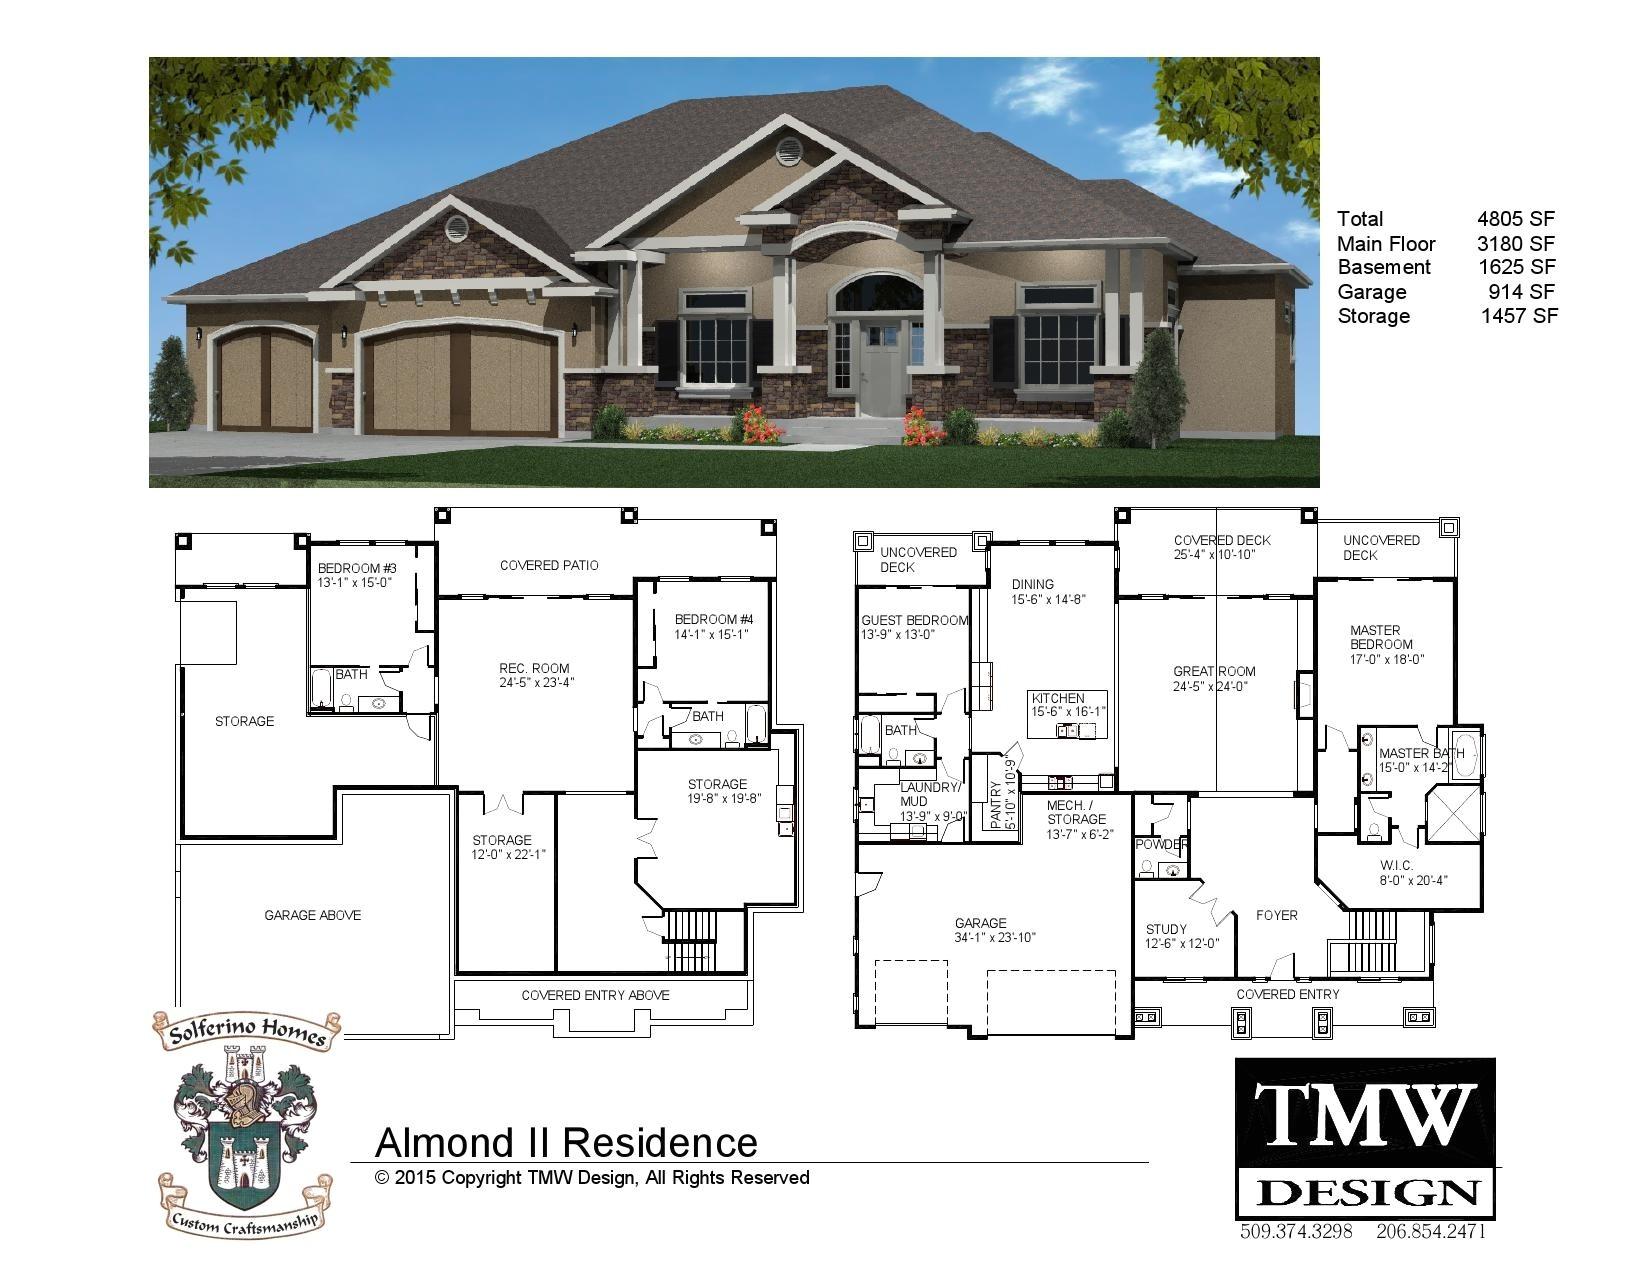 Rambler House Plans Mn Rambler House Plans with Basement Mn Basement